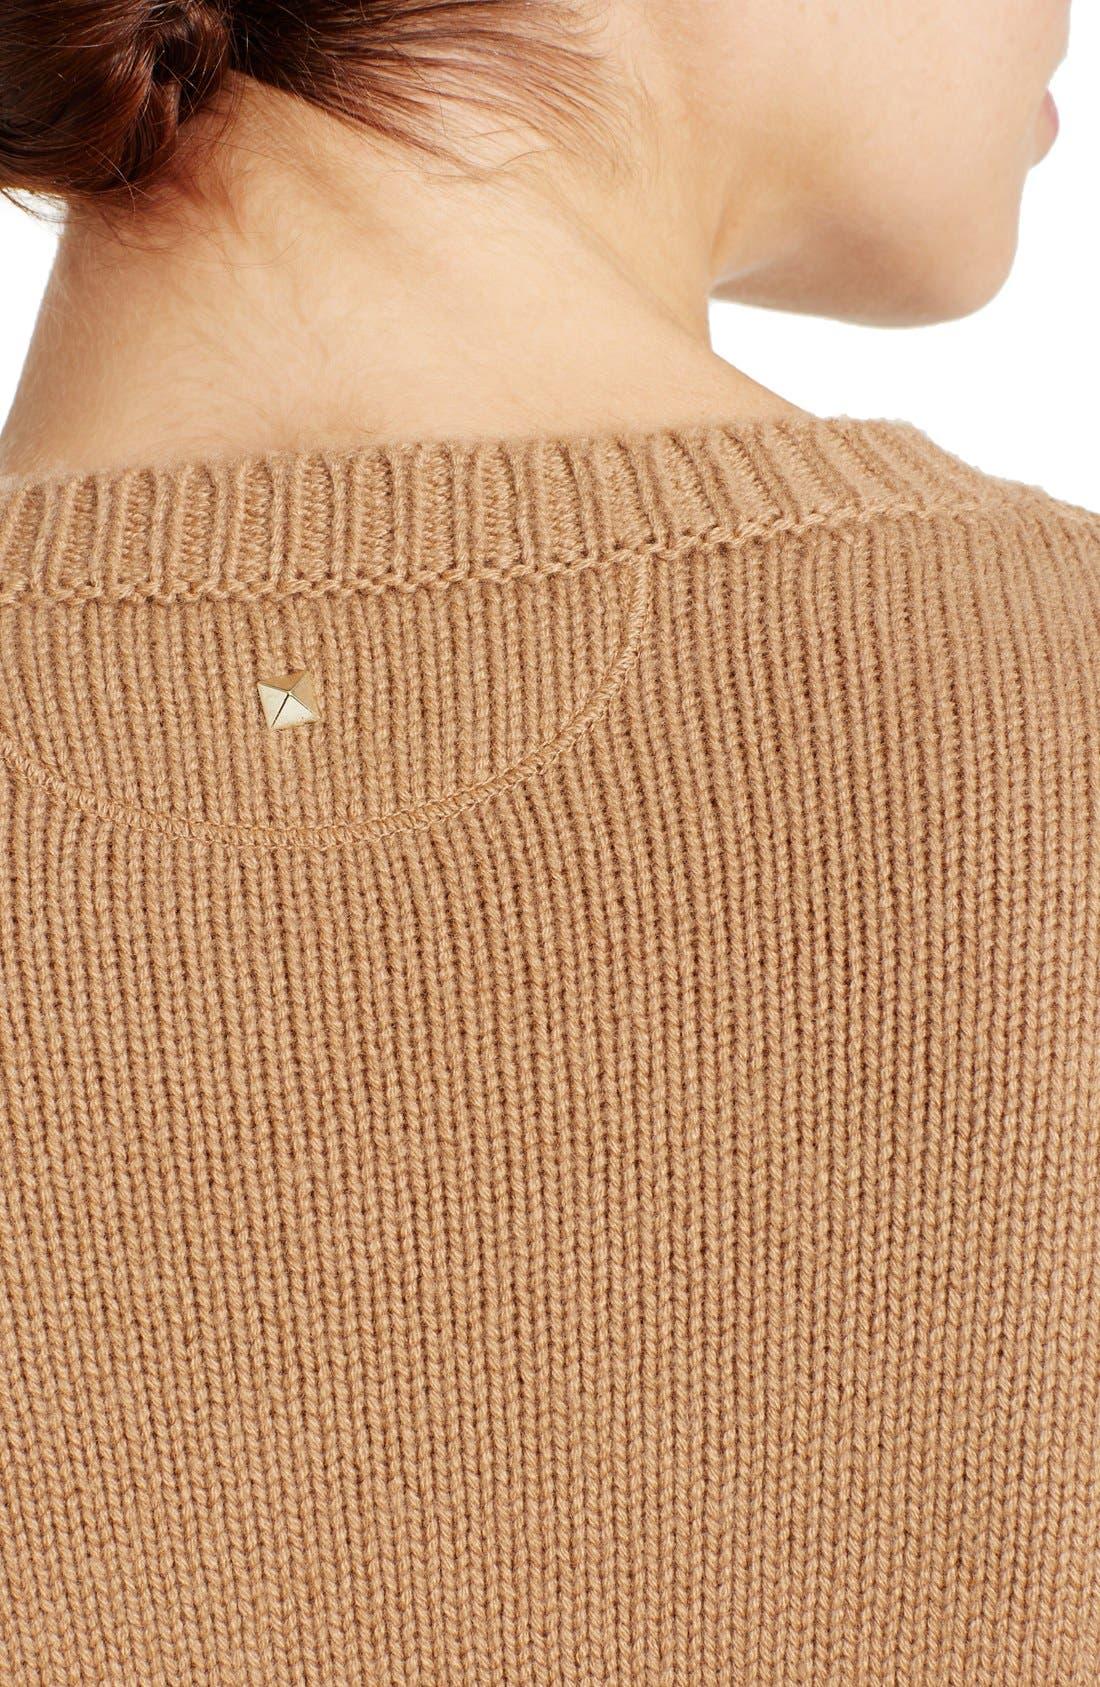 Studded Crewneck Cashmere Sweater,                             Alternate thumbnail 5, color,                             CAMEL